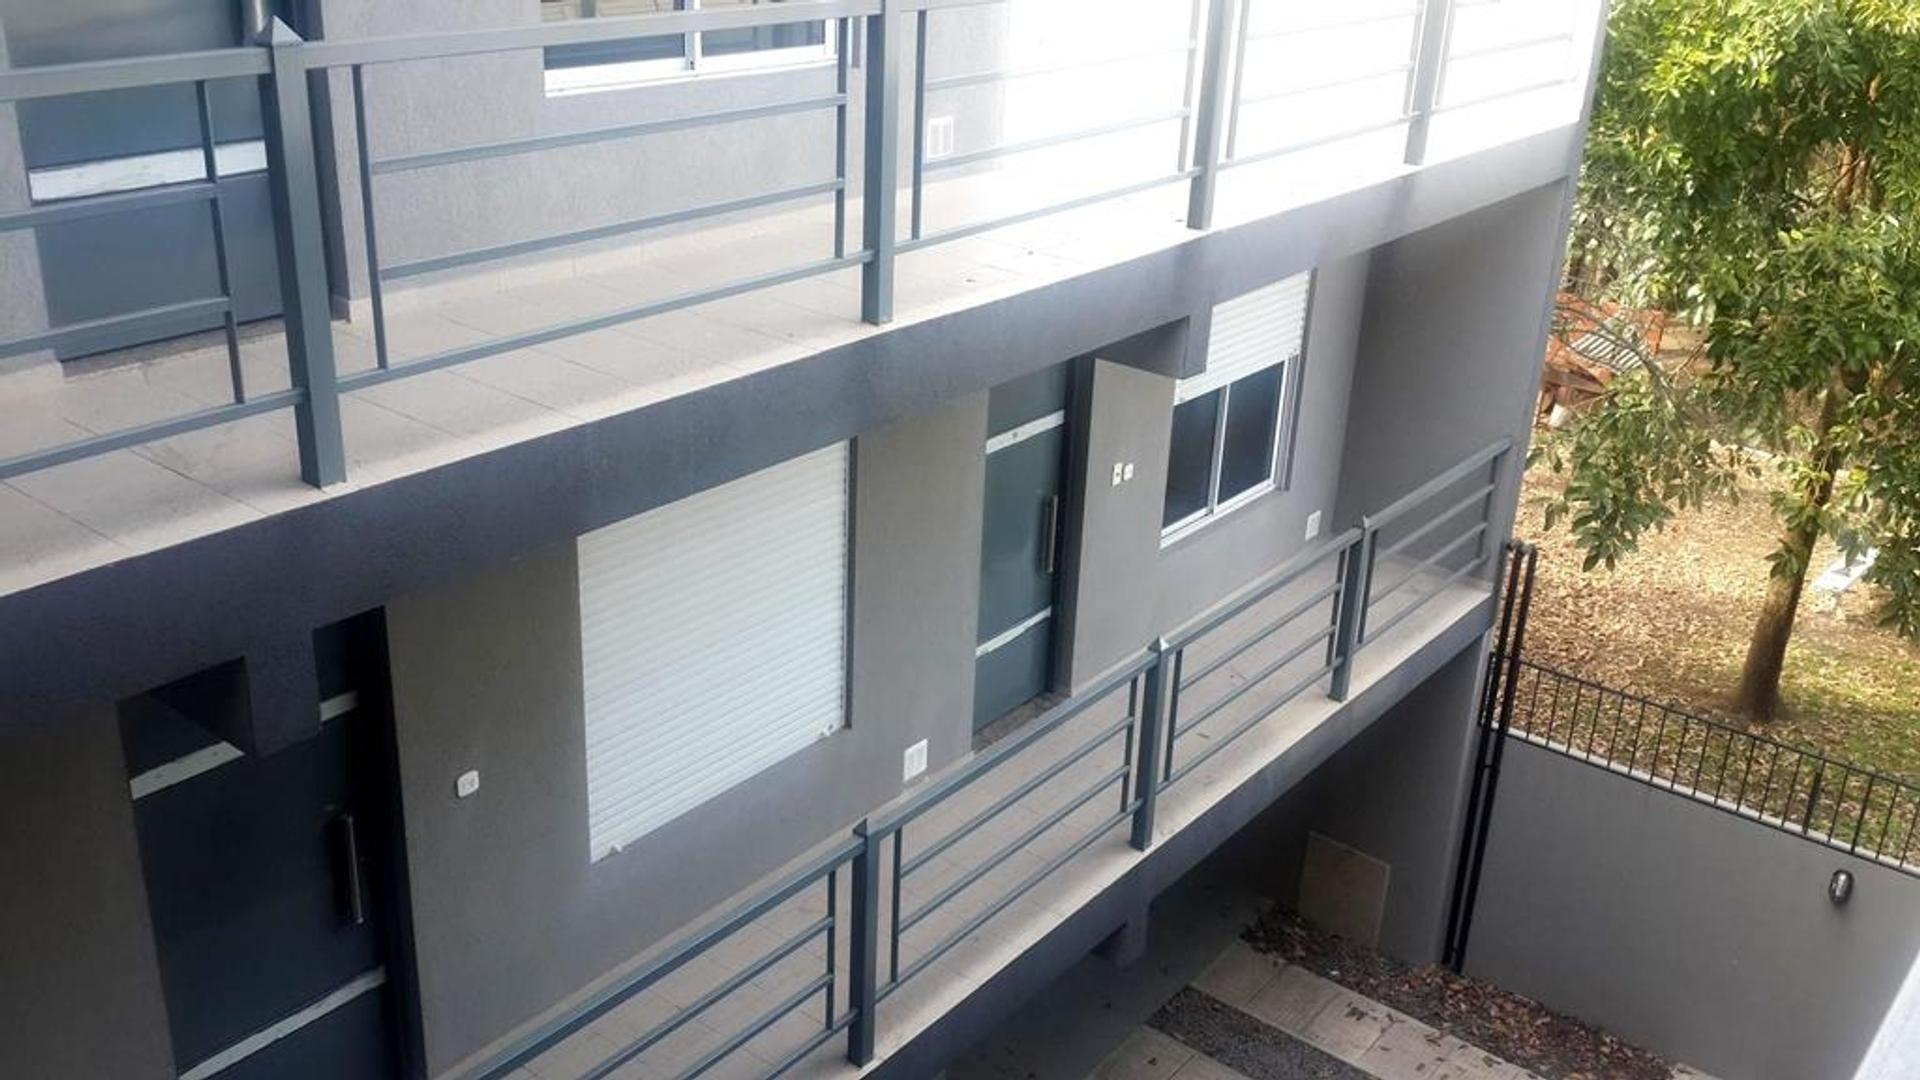 Juan Josej Paso 1000 - U$D 60.700 - Departamento en Venta